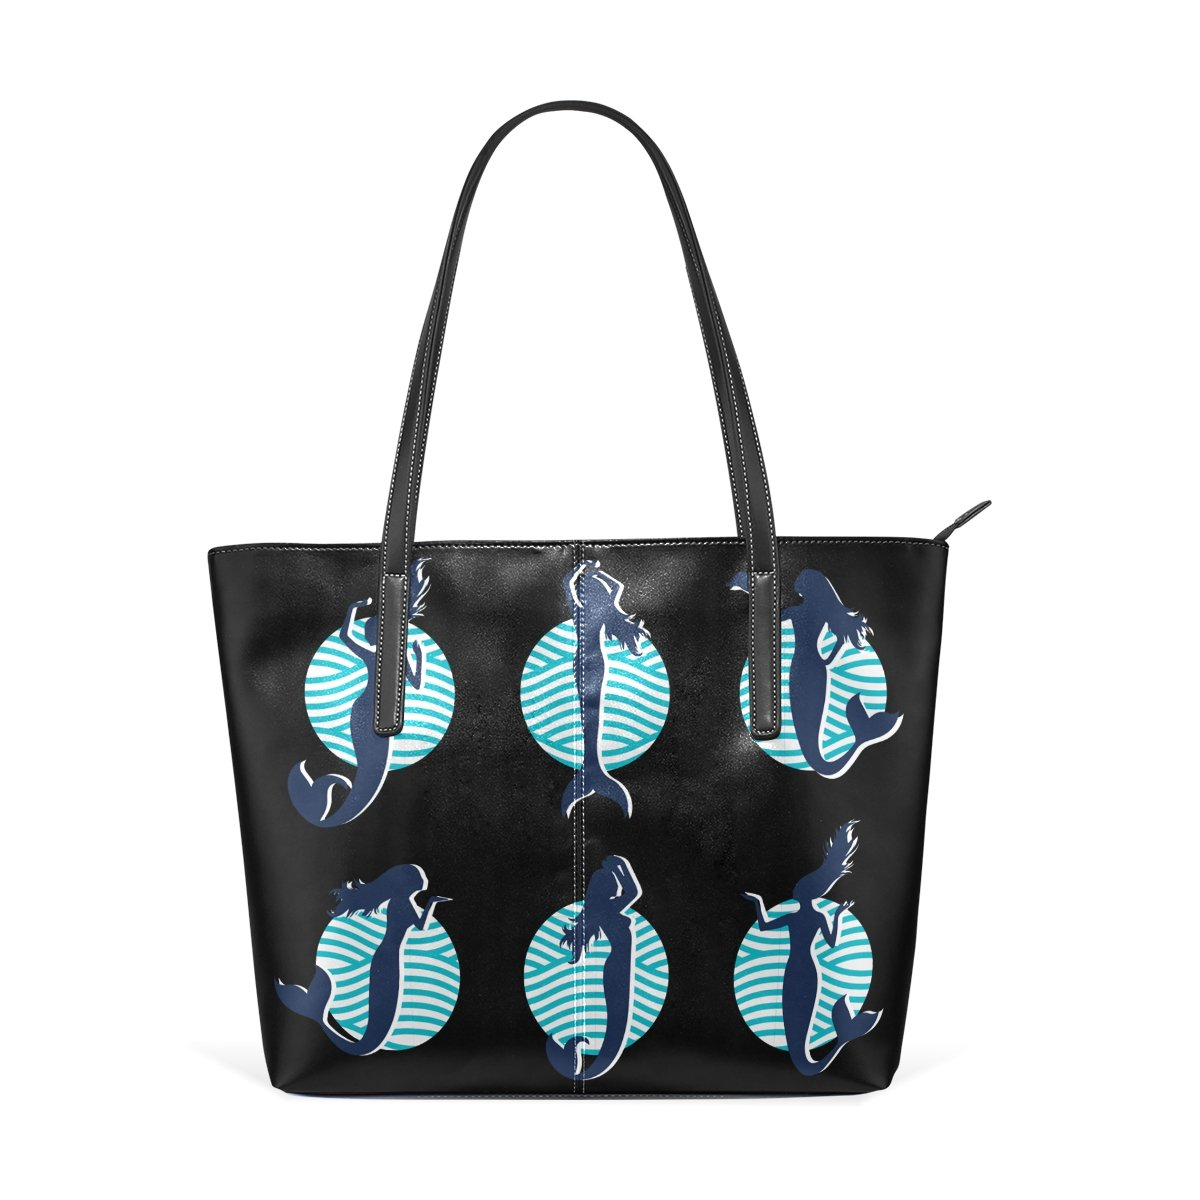 af420cff6902 Amazon.com: Womens Leather Handbags Funny Mermaid Purses Shoulder ...